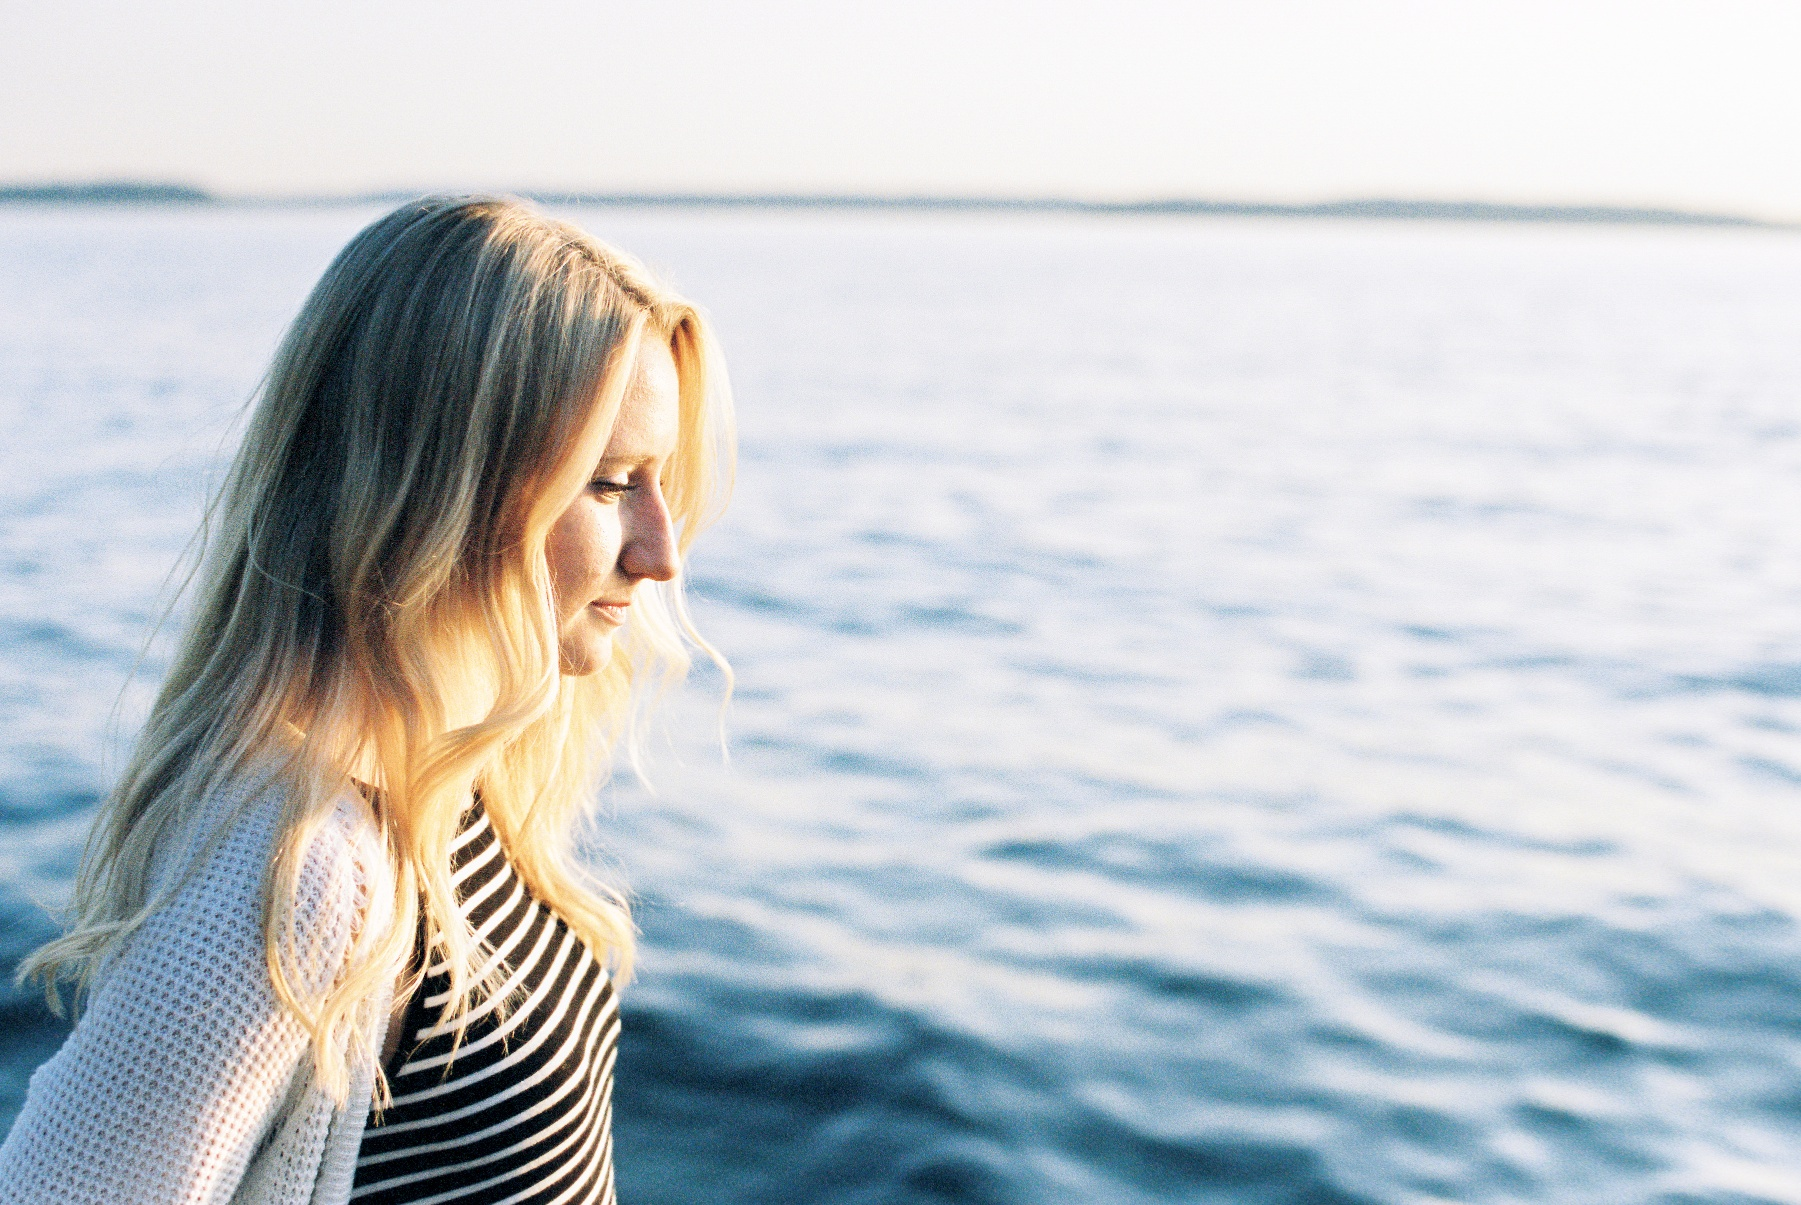 seattle film photographer senior pictures photos alki beach west seattle ocean canon kodak portra 400 film